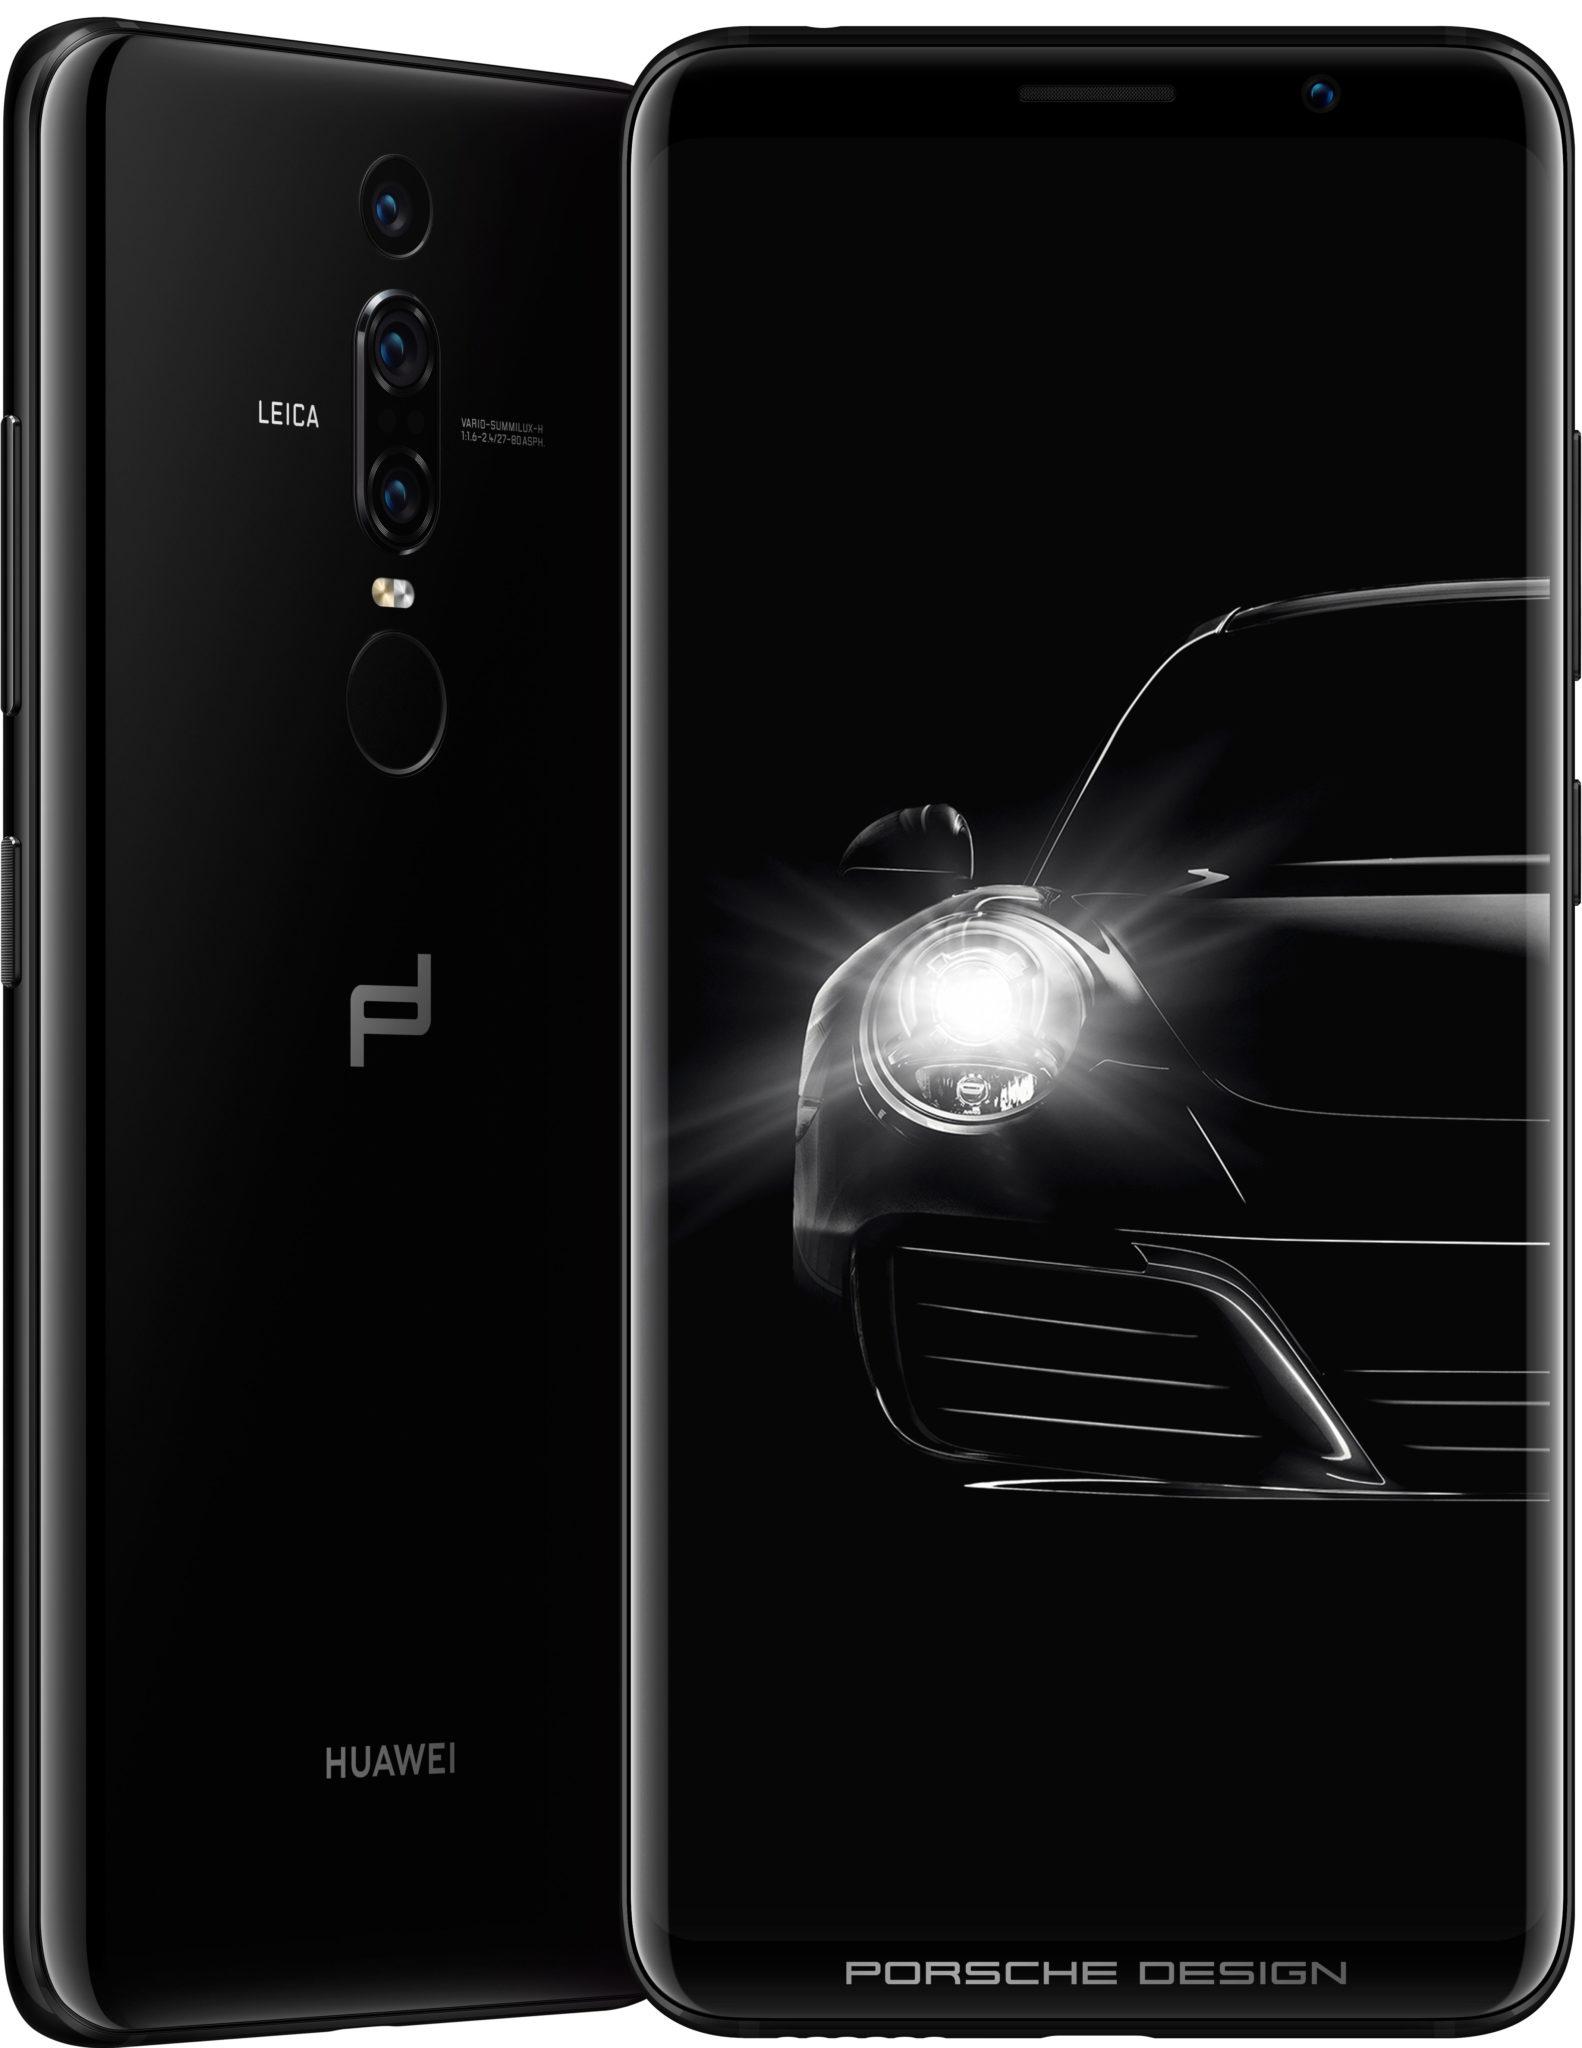 Huawei Mate RS Porsche Design smartphone